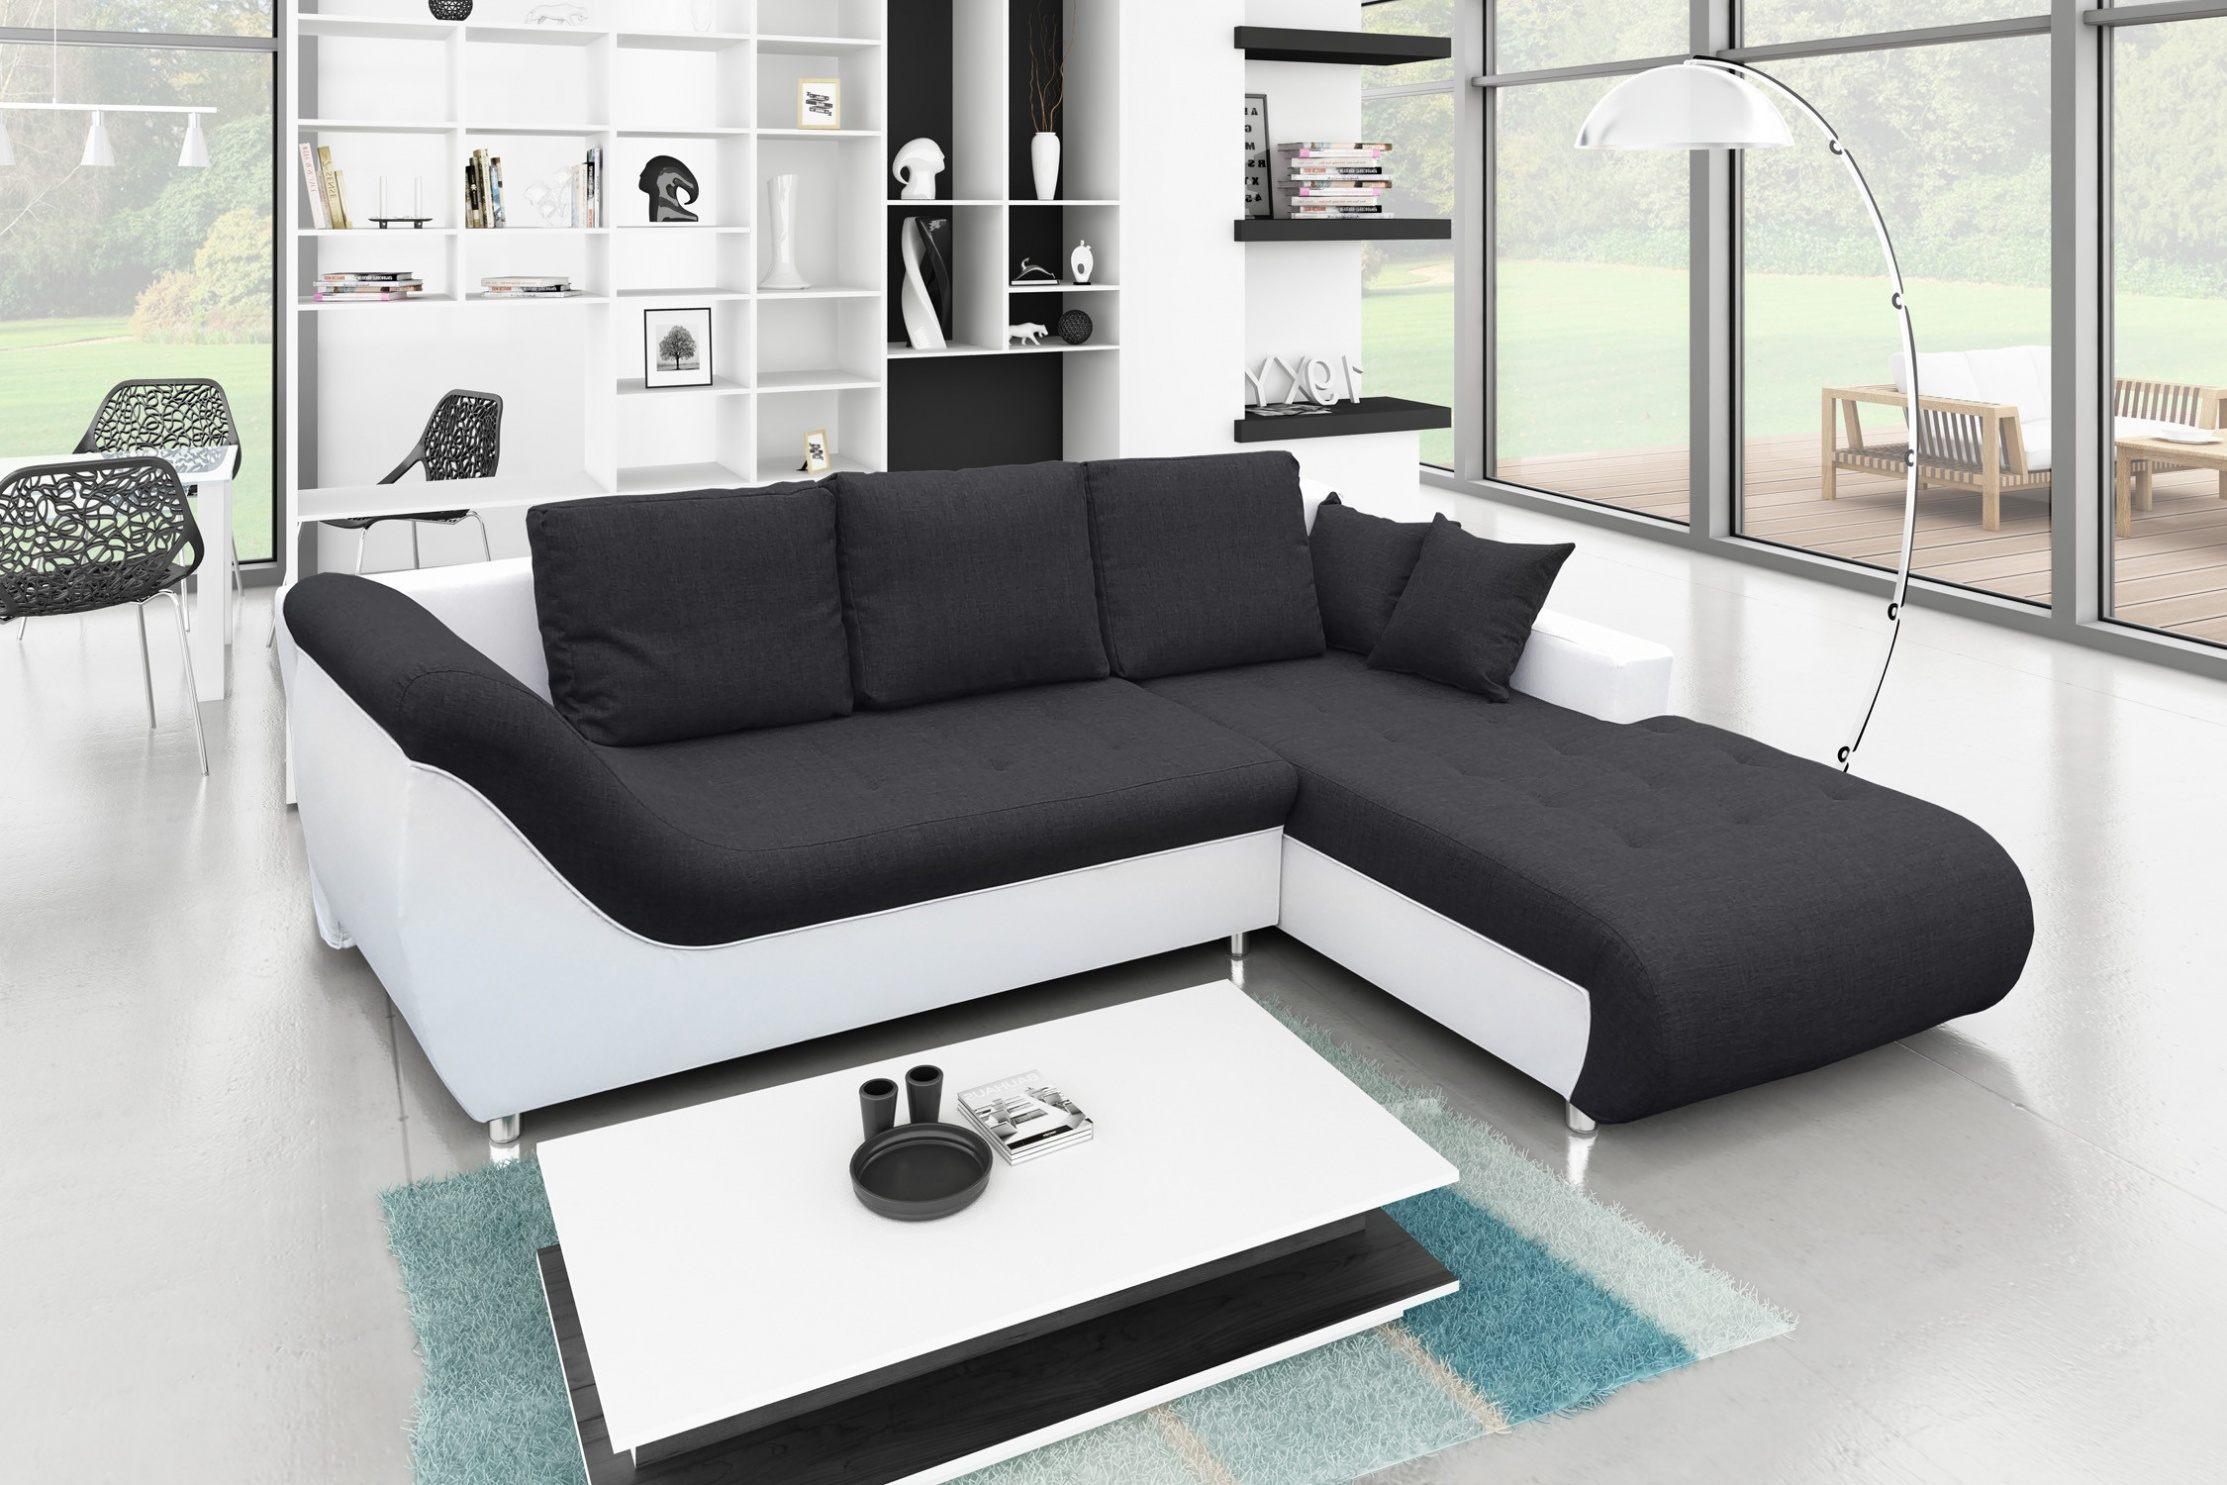 Canapé Lit 160×200 Inspiré Maha De Canapé Lit Angle Mahagranda De Home